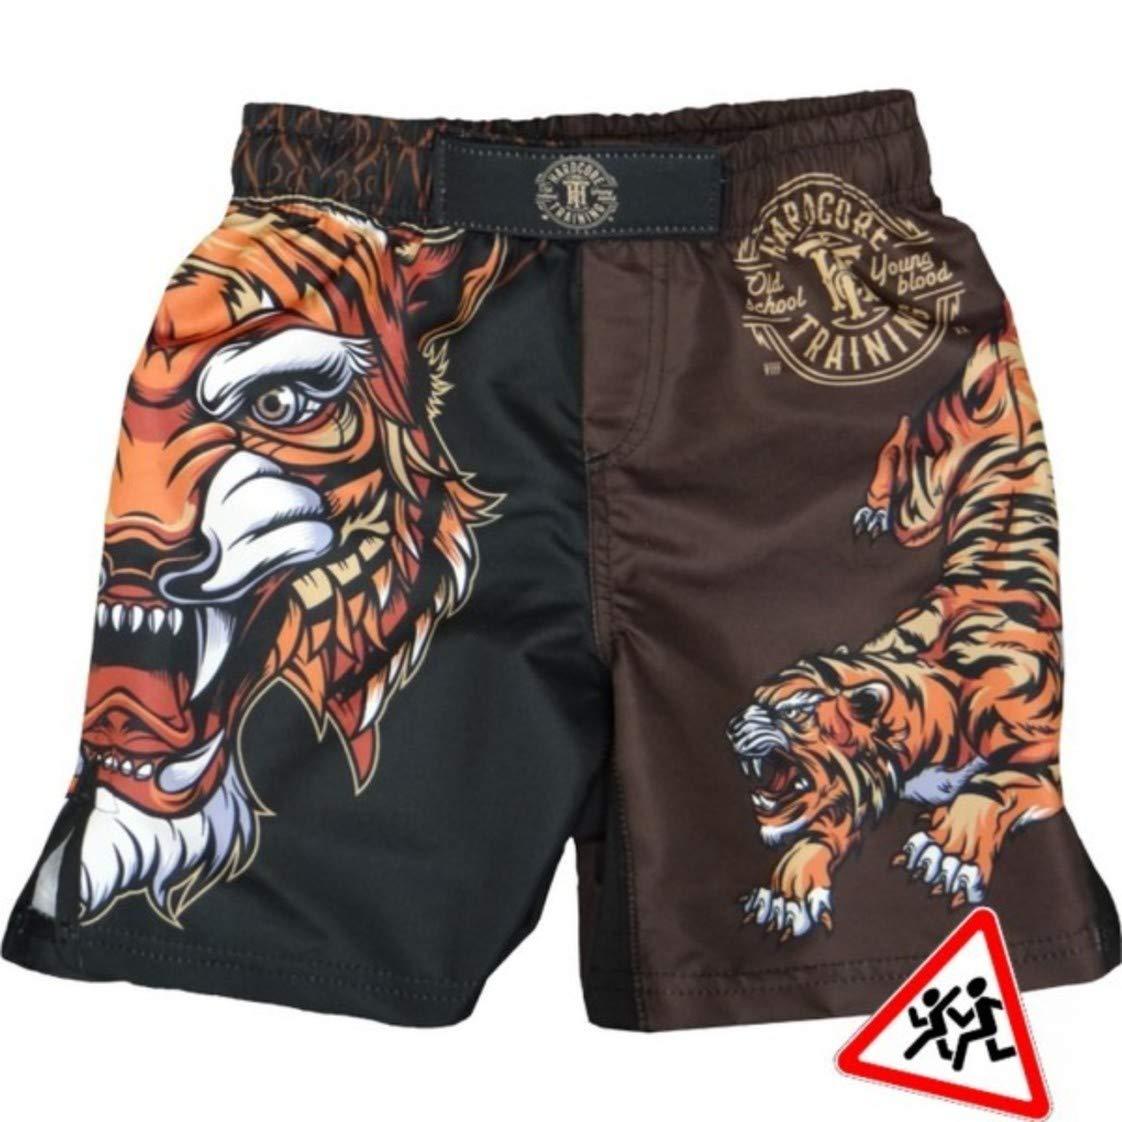 Hardcore Training Kids Shorts Tiger-10 Years Black